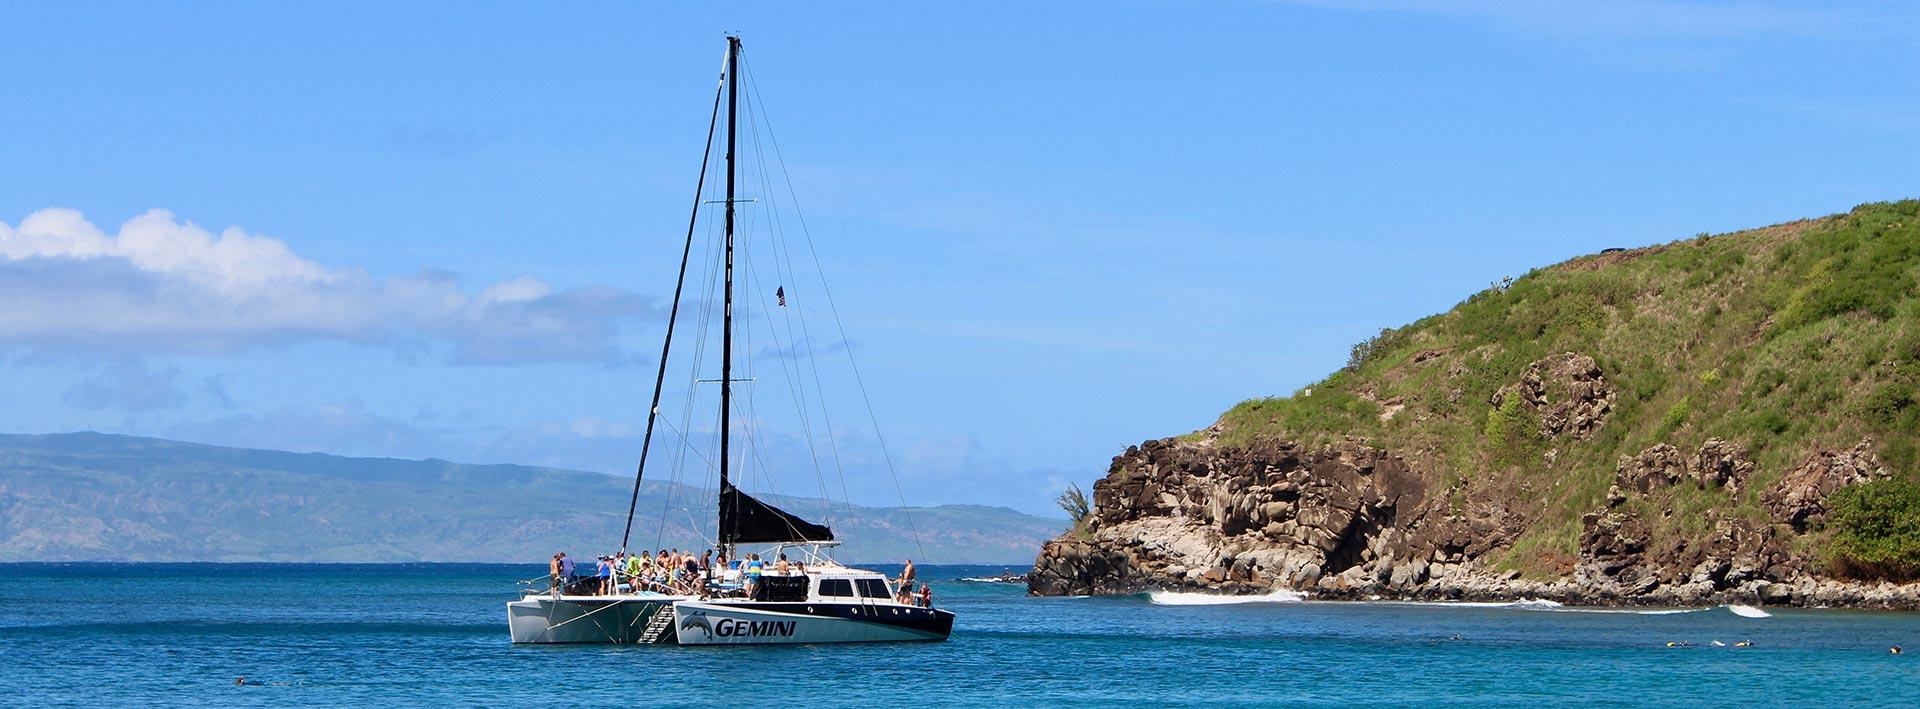 Gemini Sailing Charters - Contact